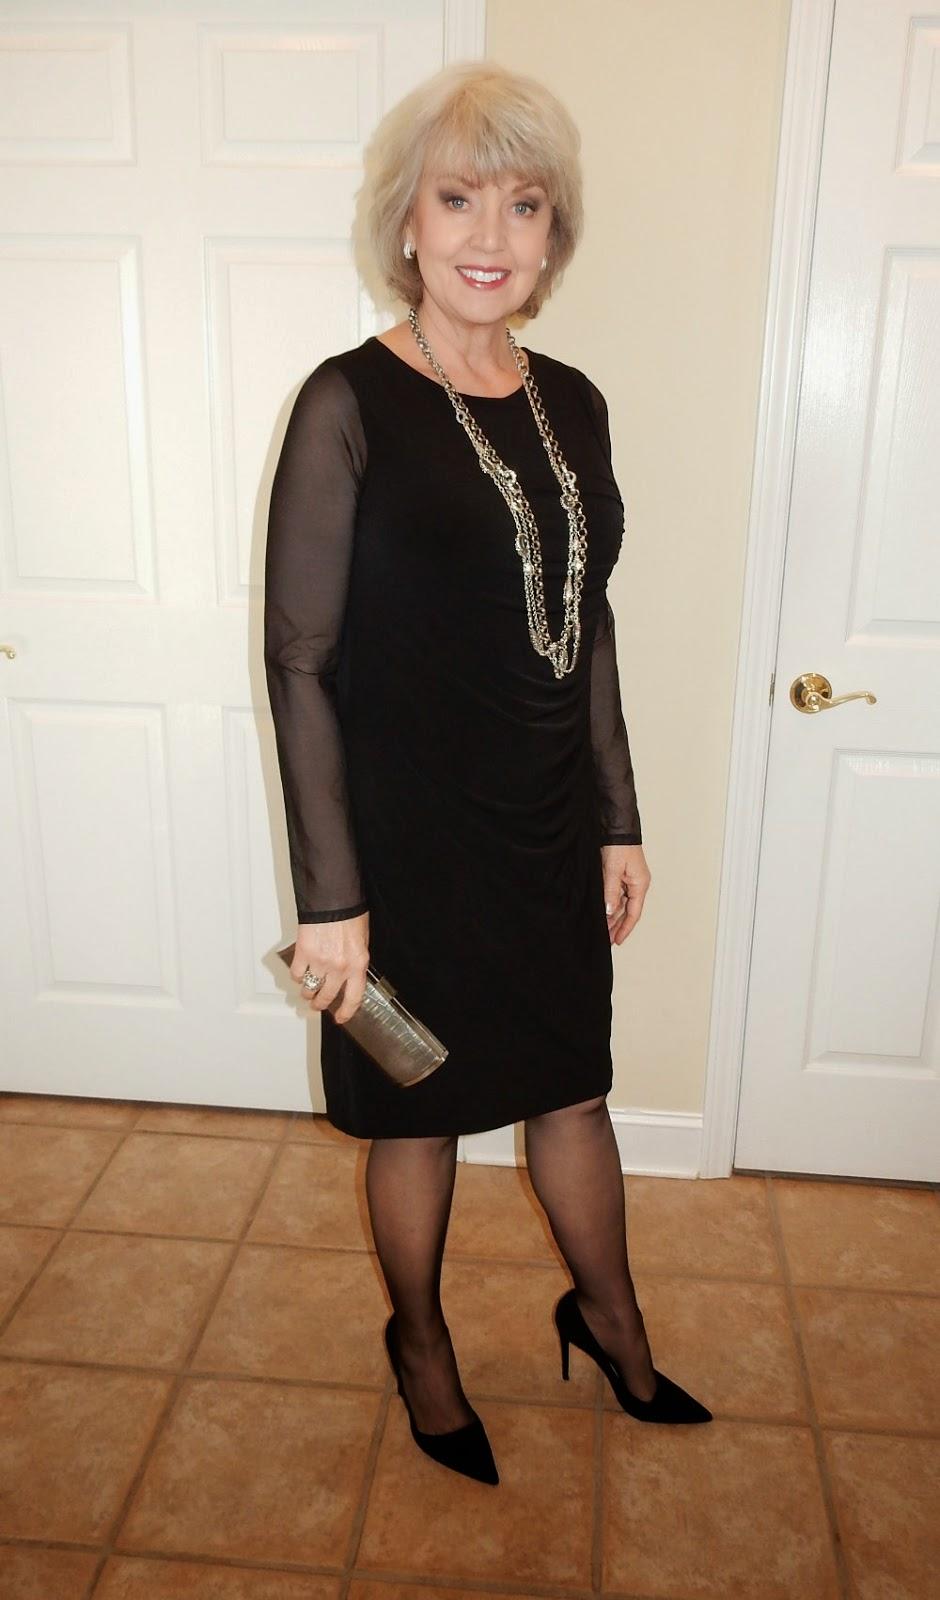 Fifty, not Frumpy: The Black Dress